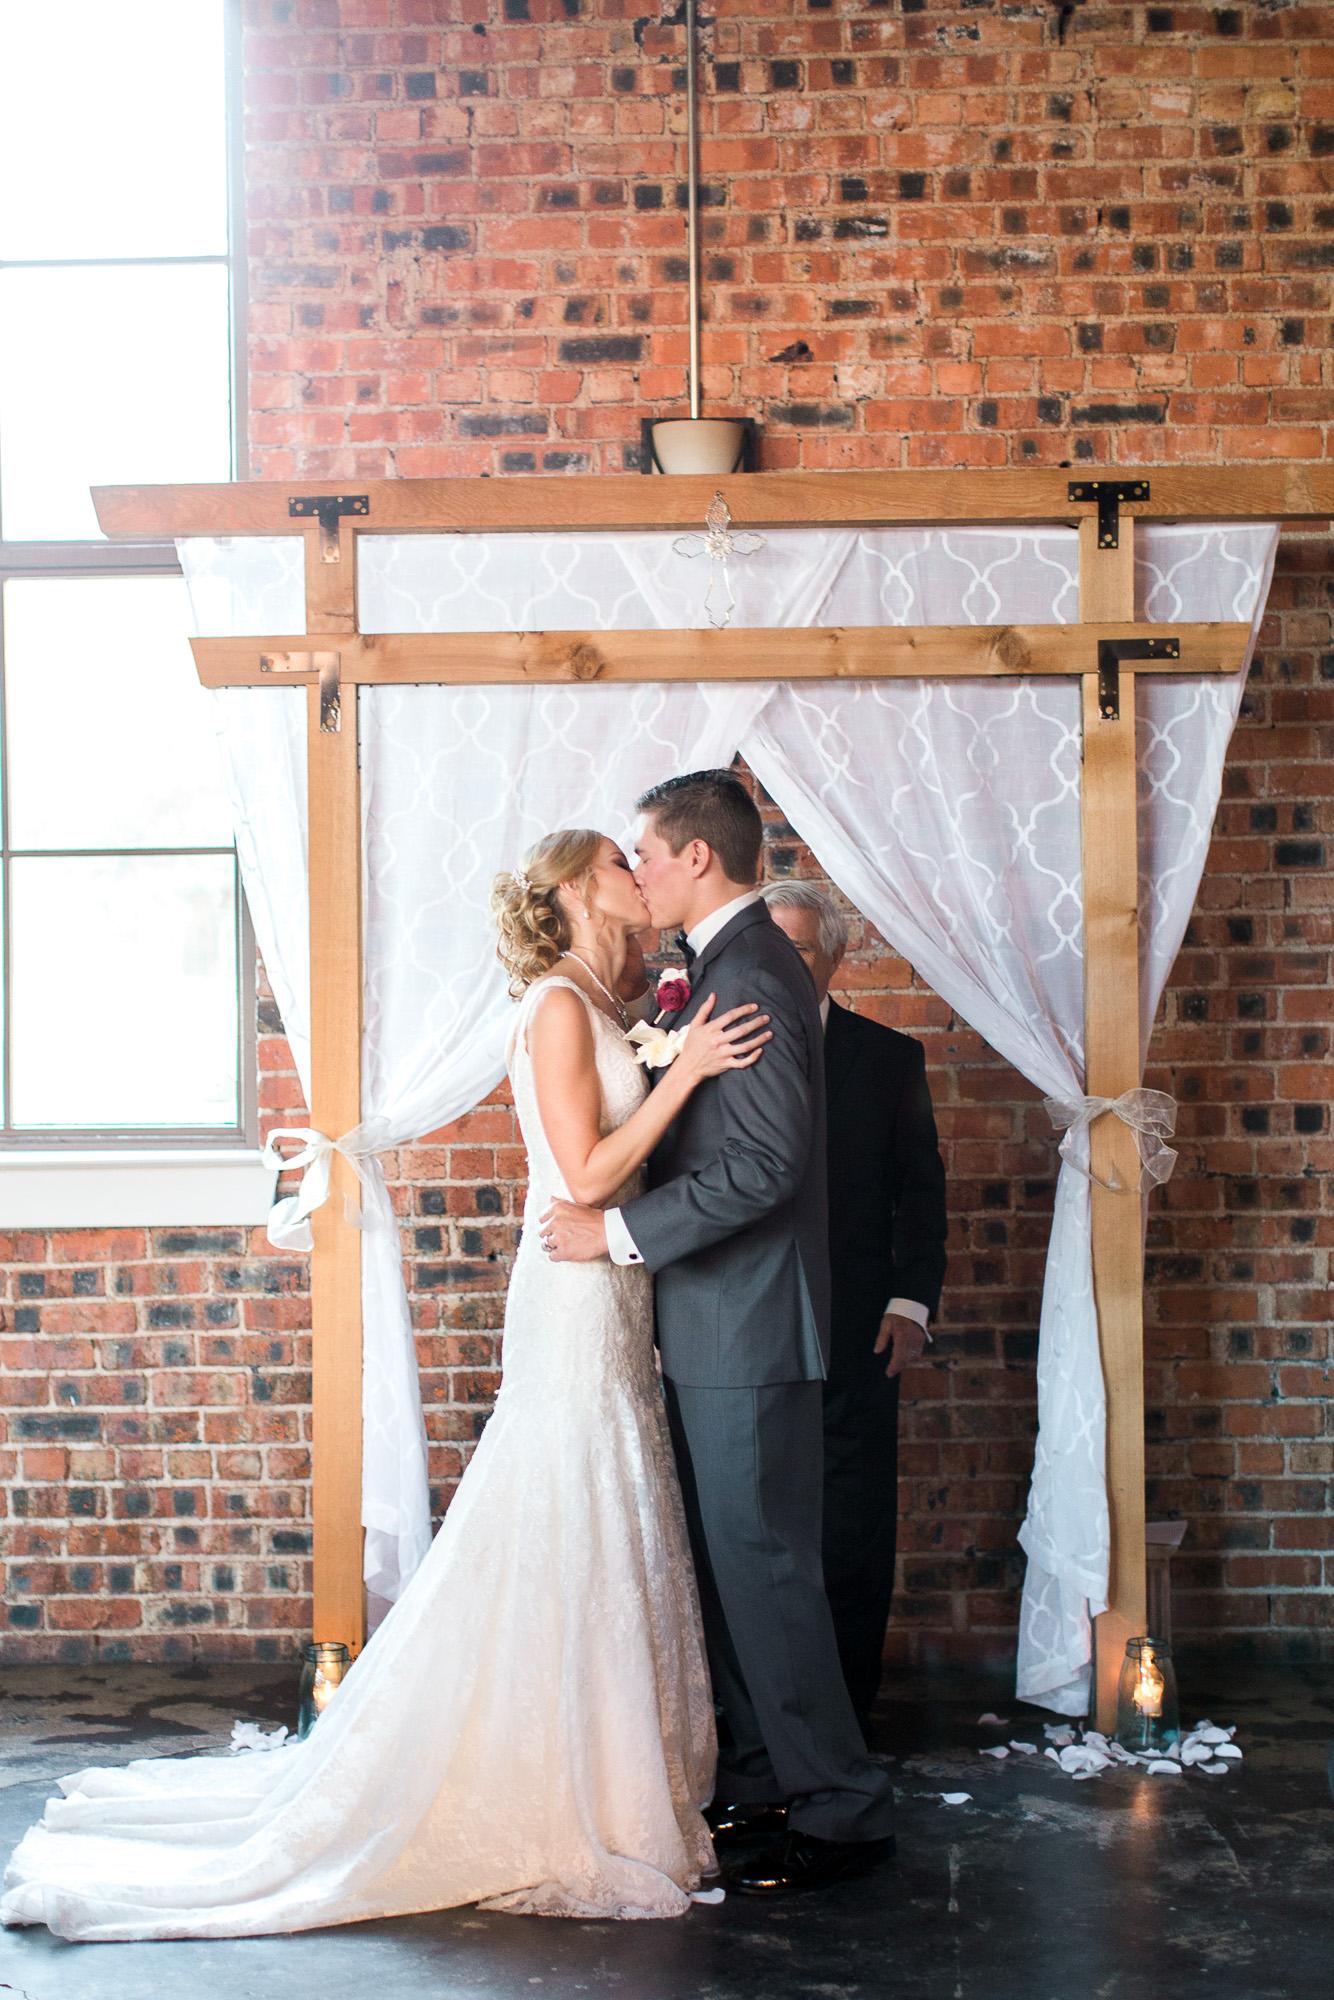 0e336-downtown-bryan-weddingdowntown-bryan-wedding.jpg